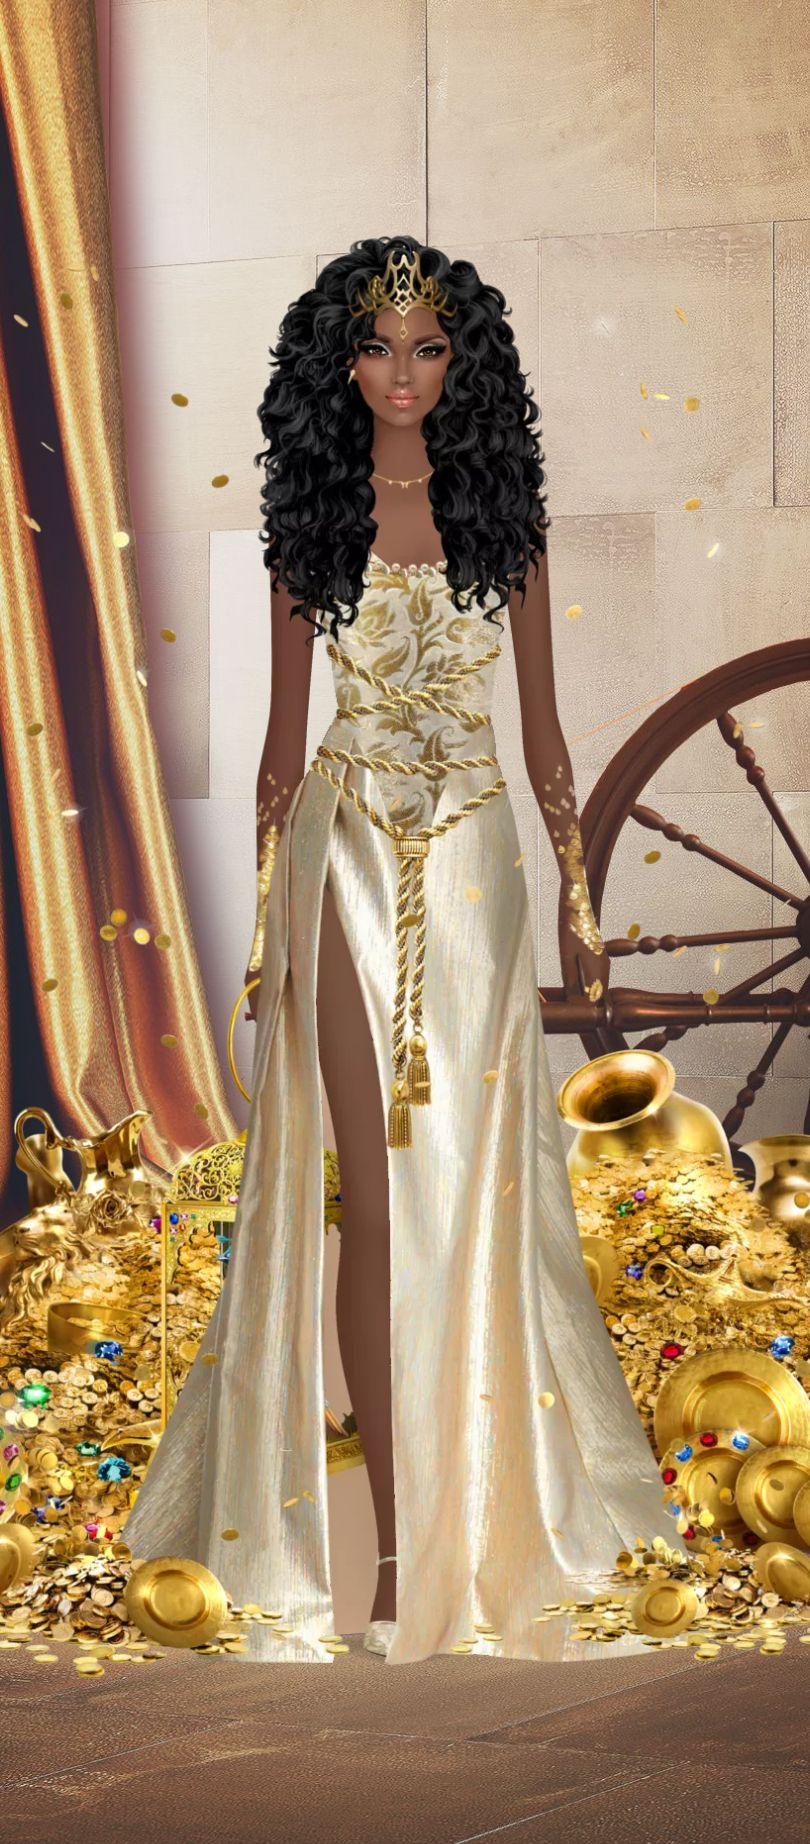 Pin By Felice Navidad On Fantasy Story Fantasy Dress Fashion Fashion Illustration [ 1844 x 810 Pixel ]